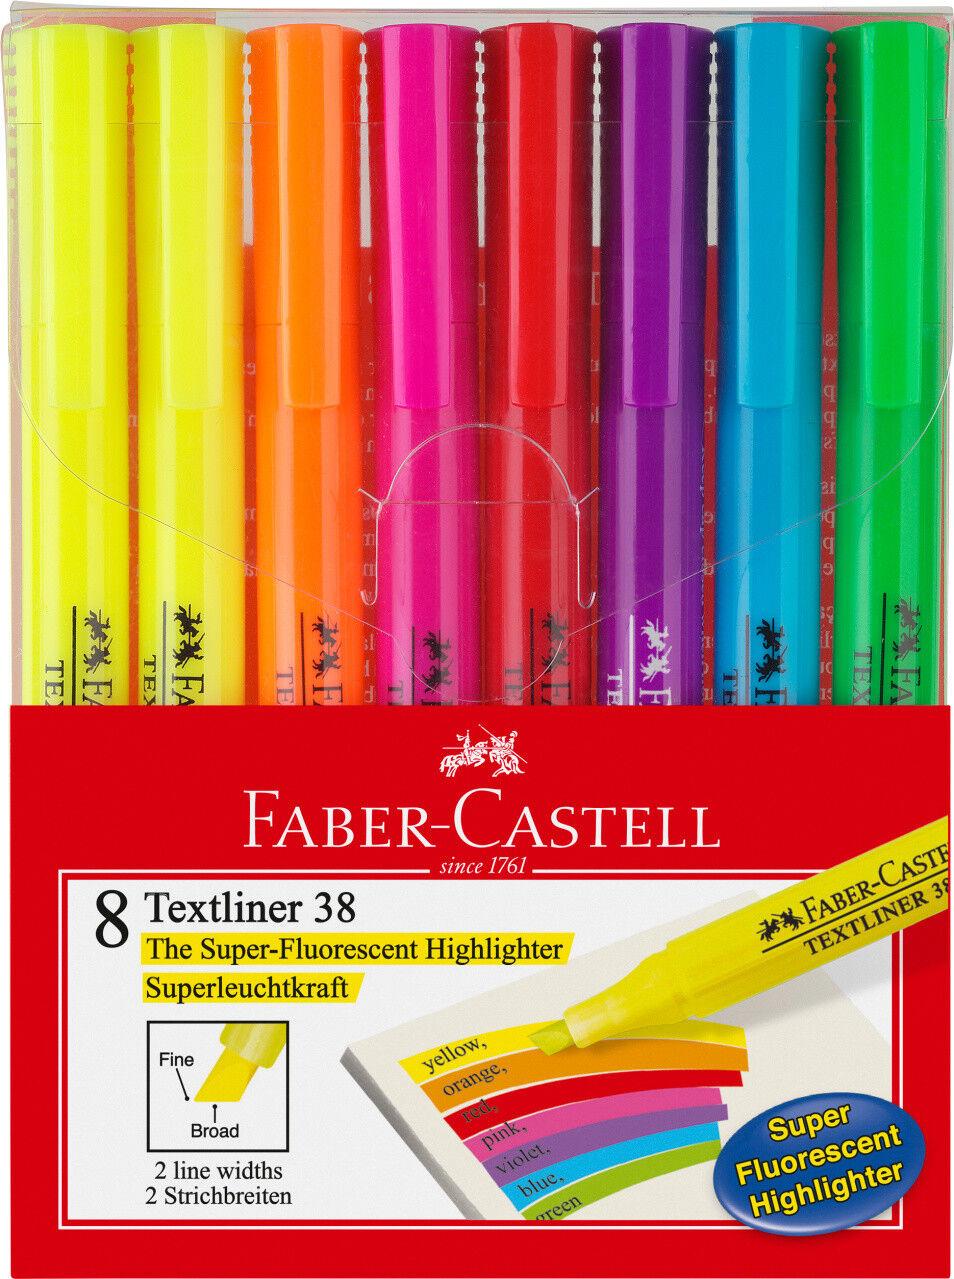 Faber-Castell TEXTLINER 38 Textmarker 8er Etui NEU&OVP *!bestPrice!*